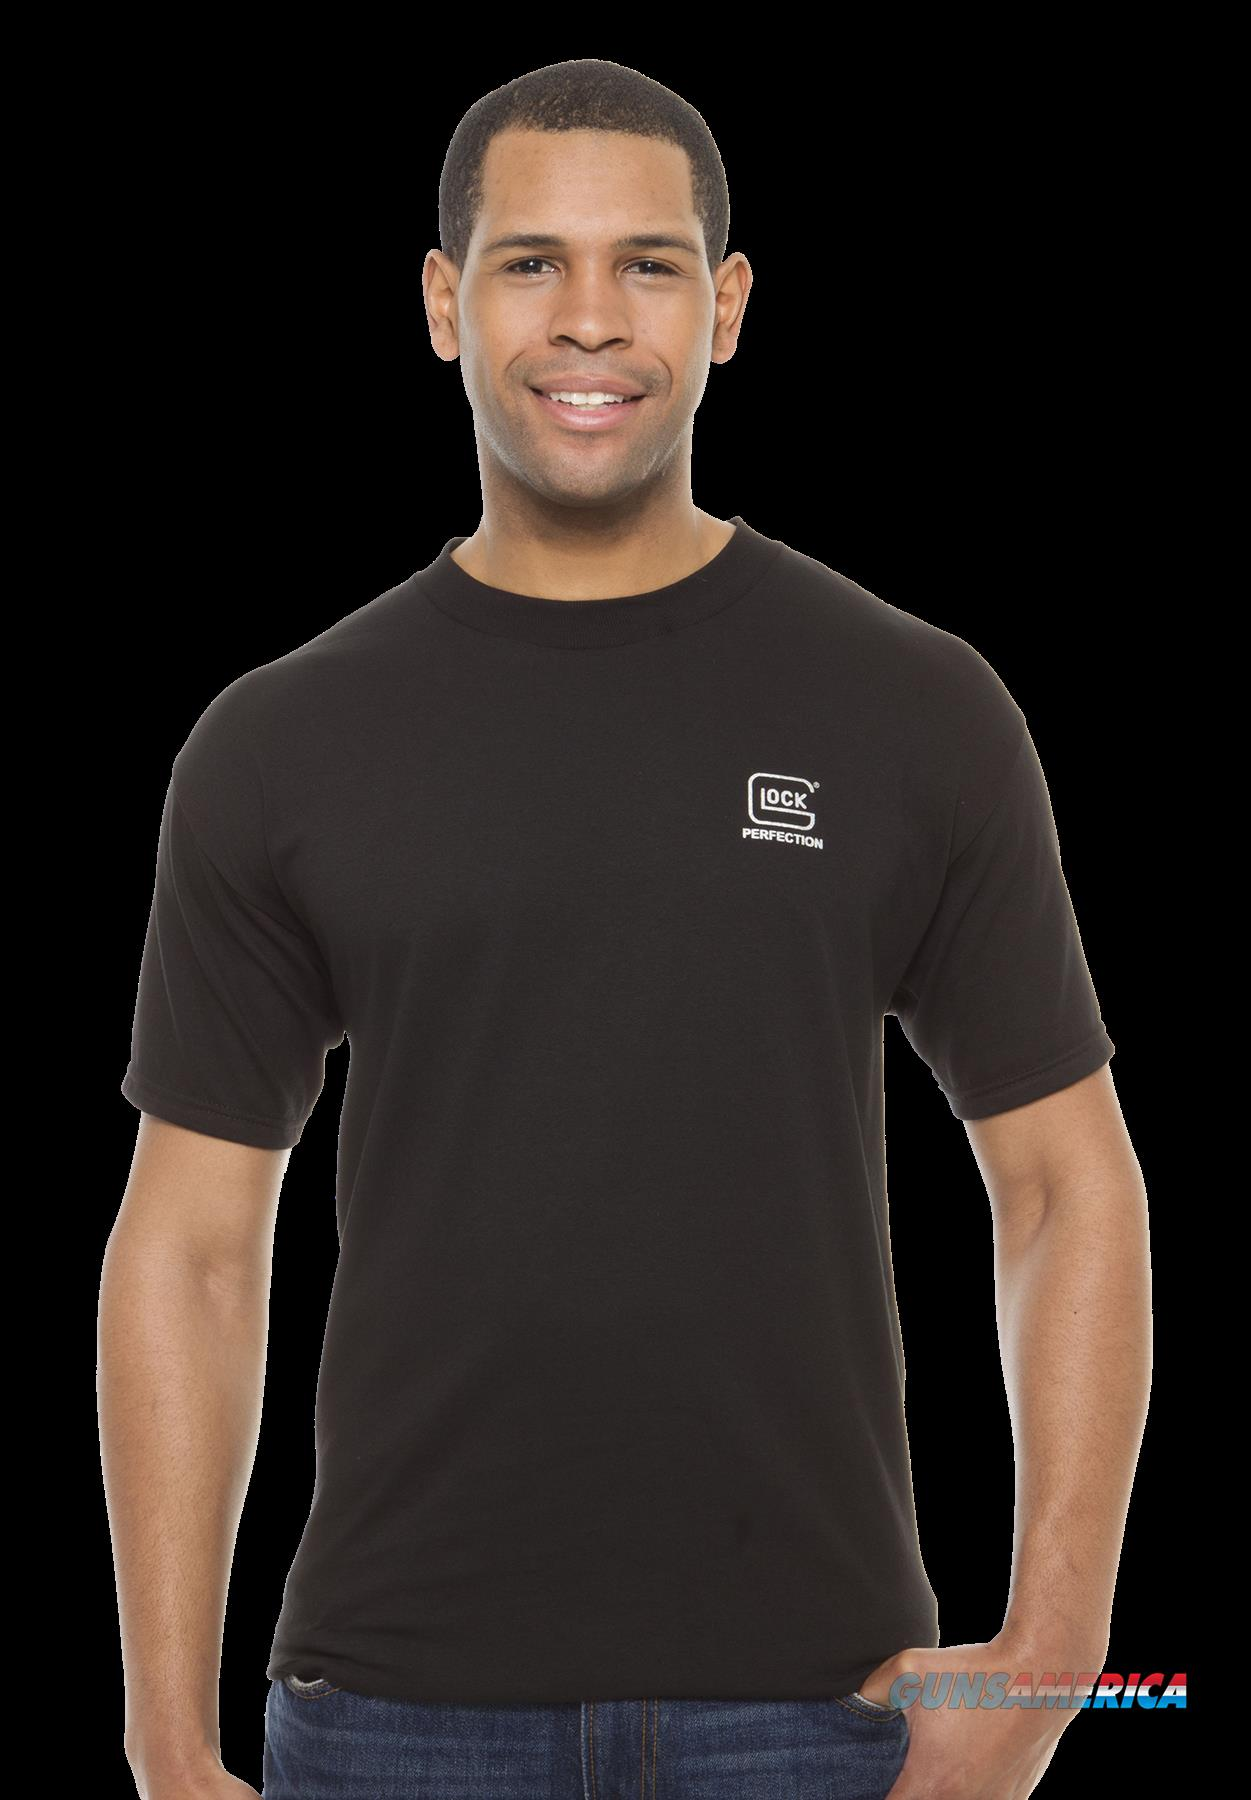 Glock T-shirt, Glock Aa11005  Perfection Tshirt Black       3xlrg  Guns > Pistols > 1911 Pistol Copies (non-Colt)